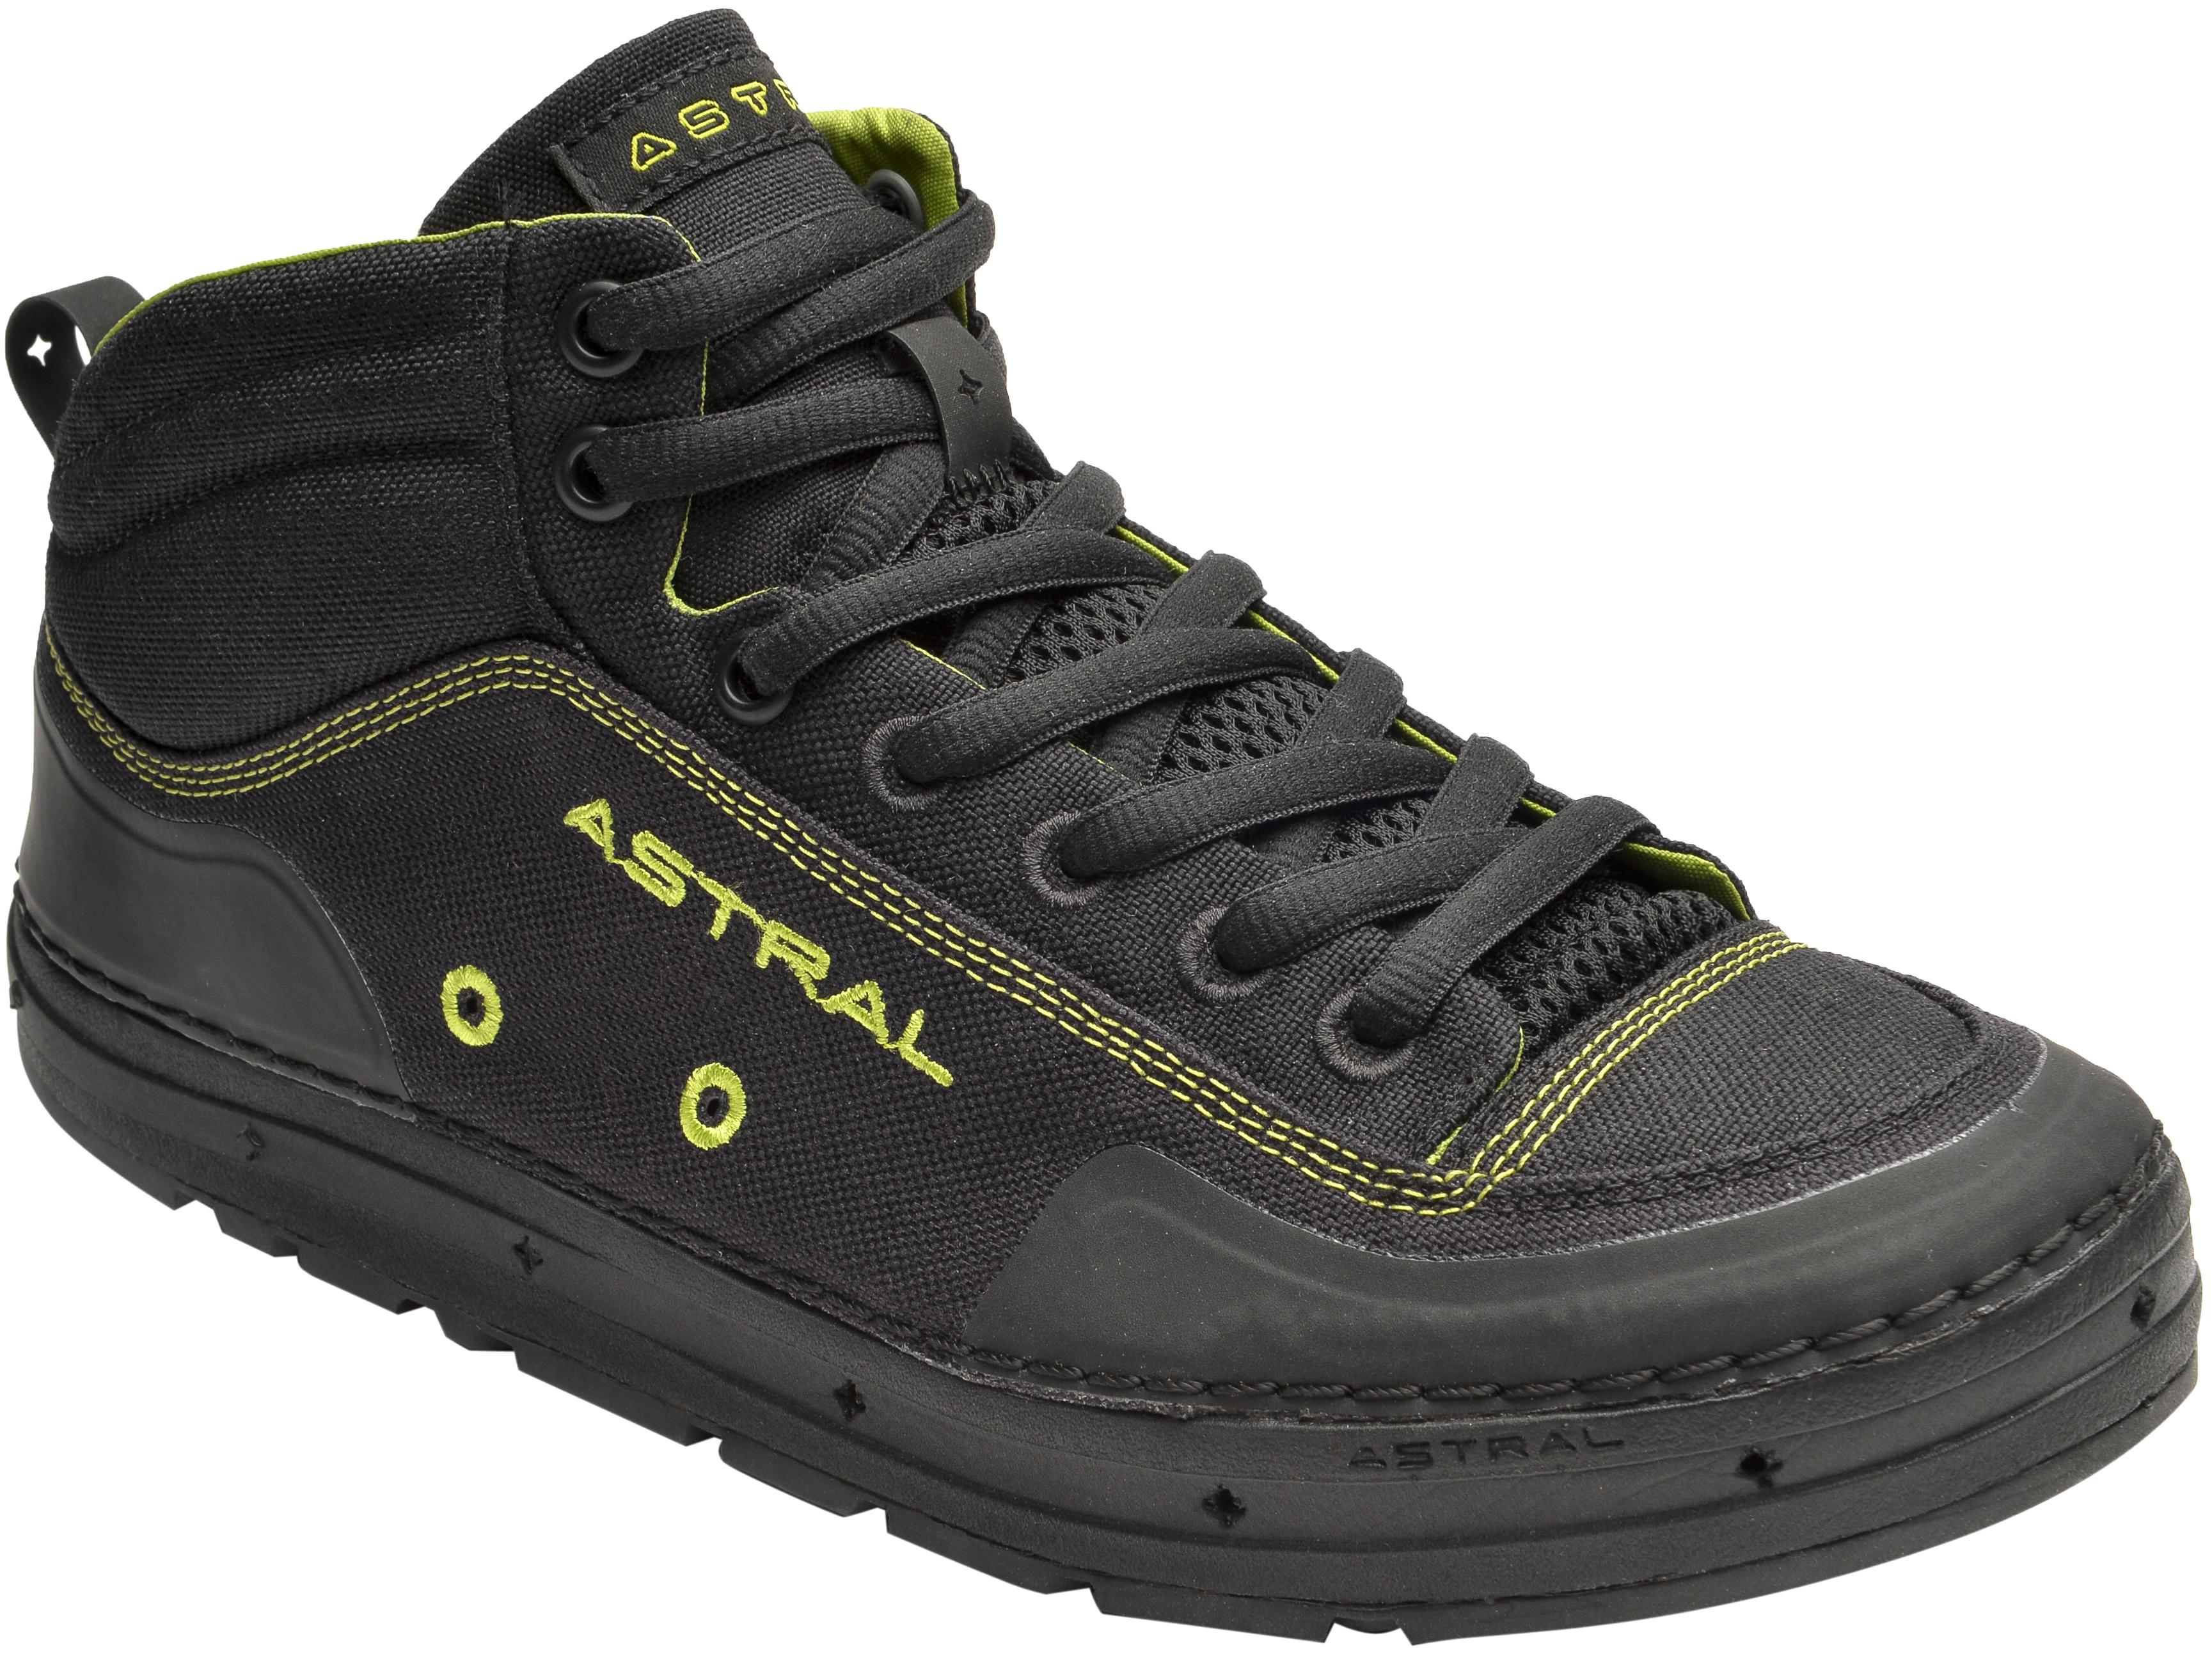 Astral Rassler Shoes - Men's   MEC